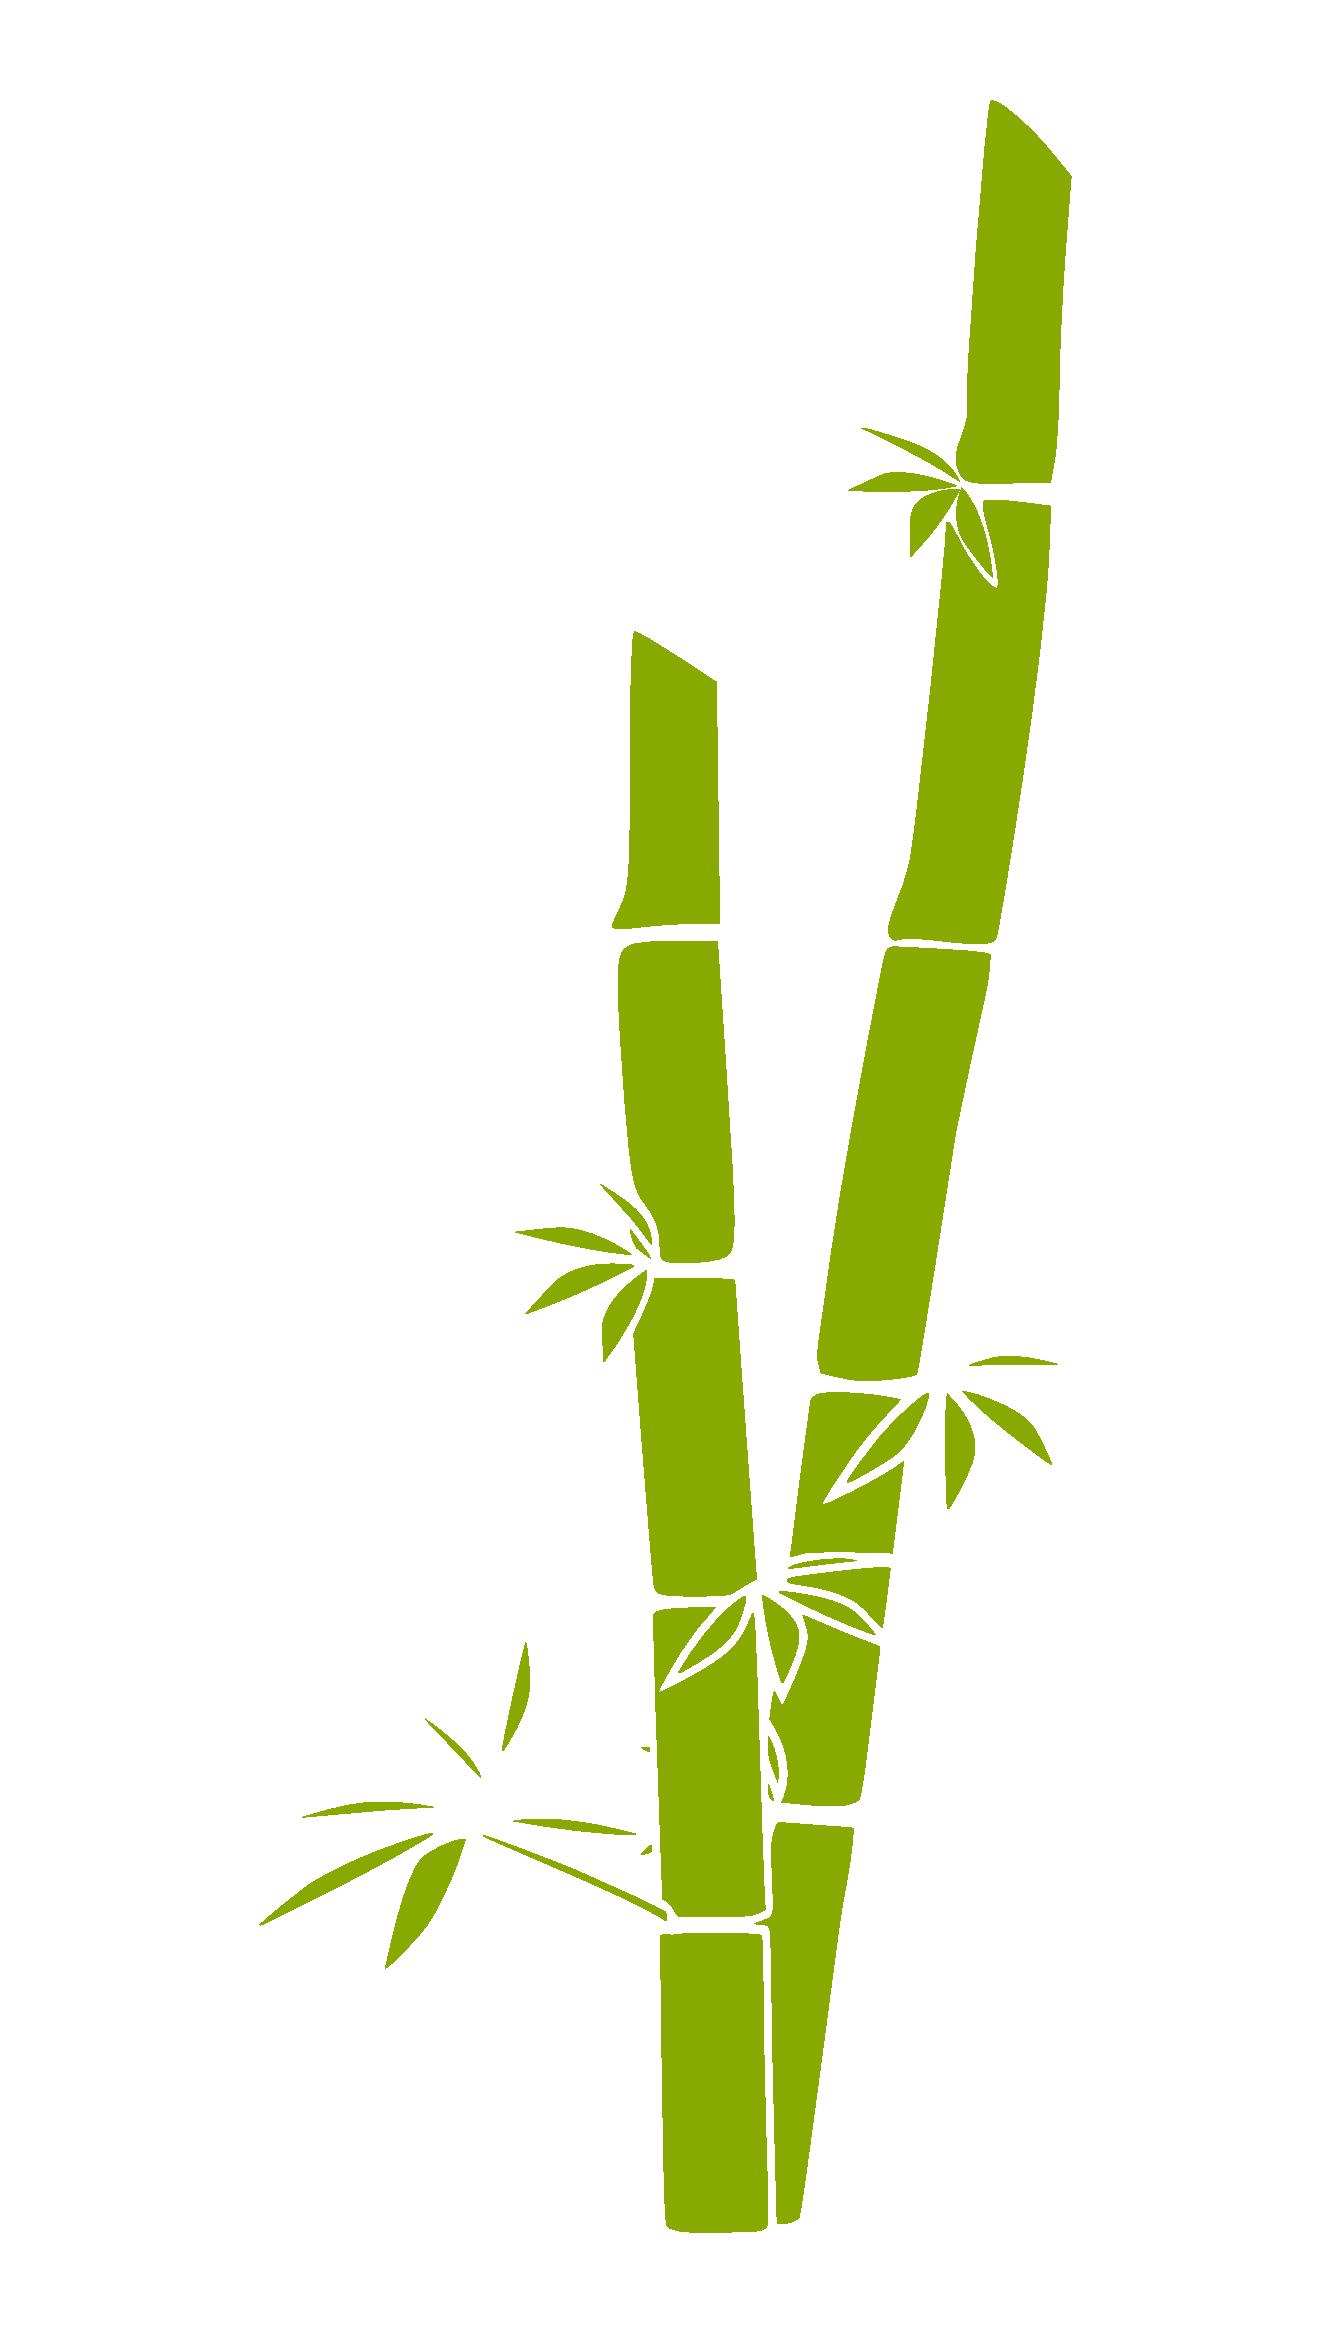 pin by bamboo planner on bamboo | bamboo drawing, bamboo art, bamboo tattoo  pinterest